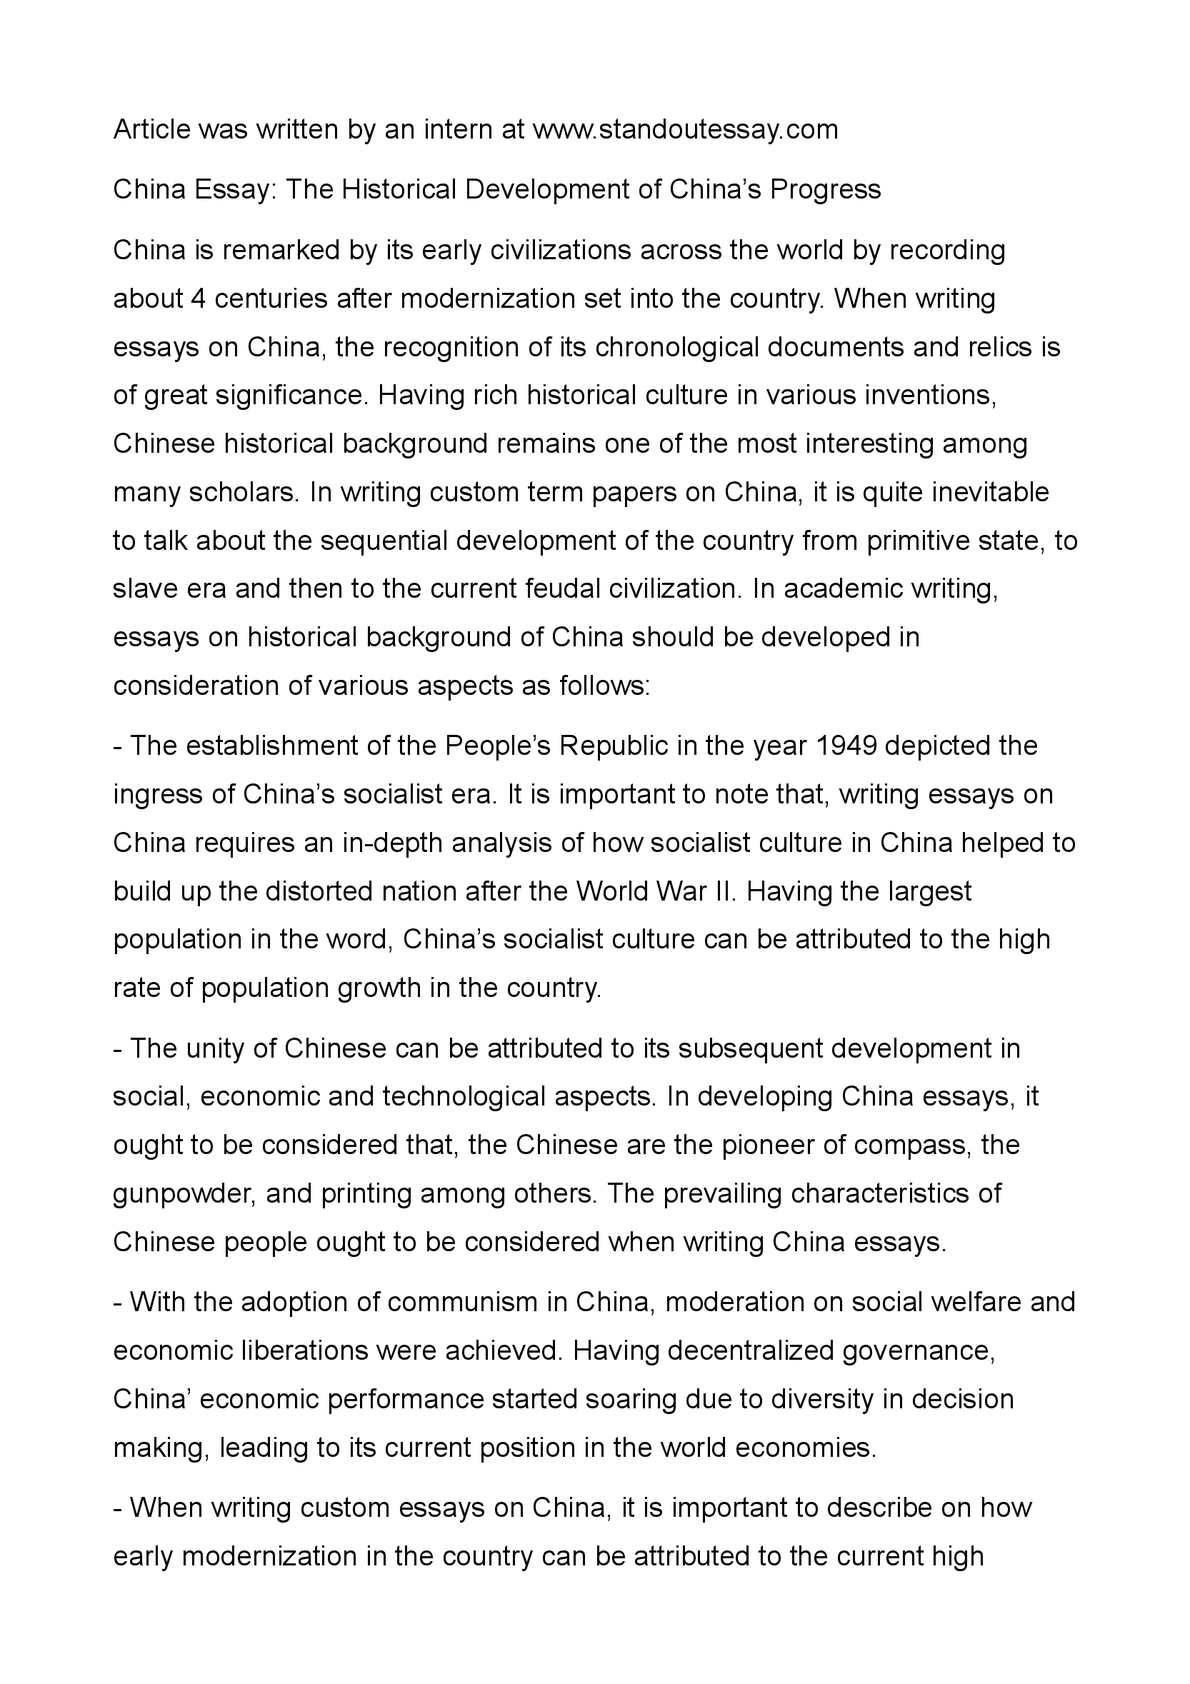 006 Essay Example Chinese Amazing Art Topics Vce Formats Sheet Full